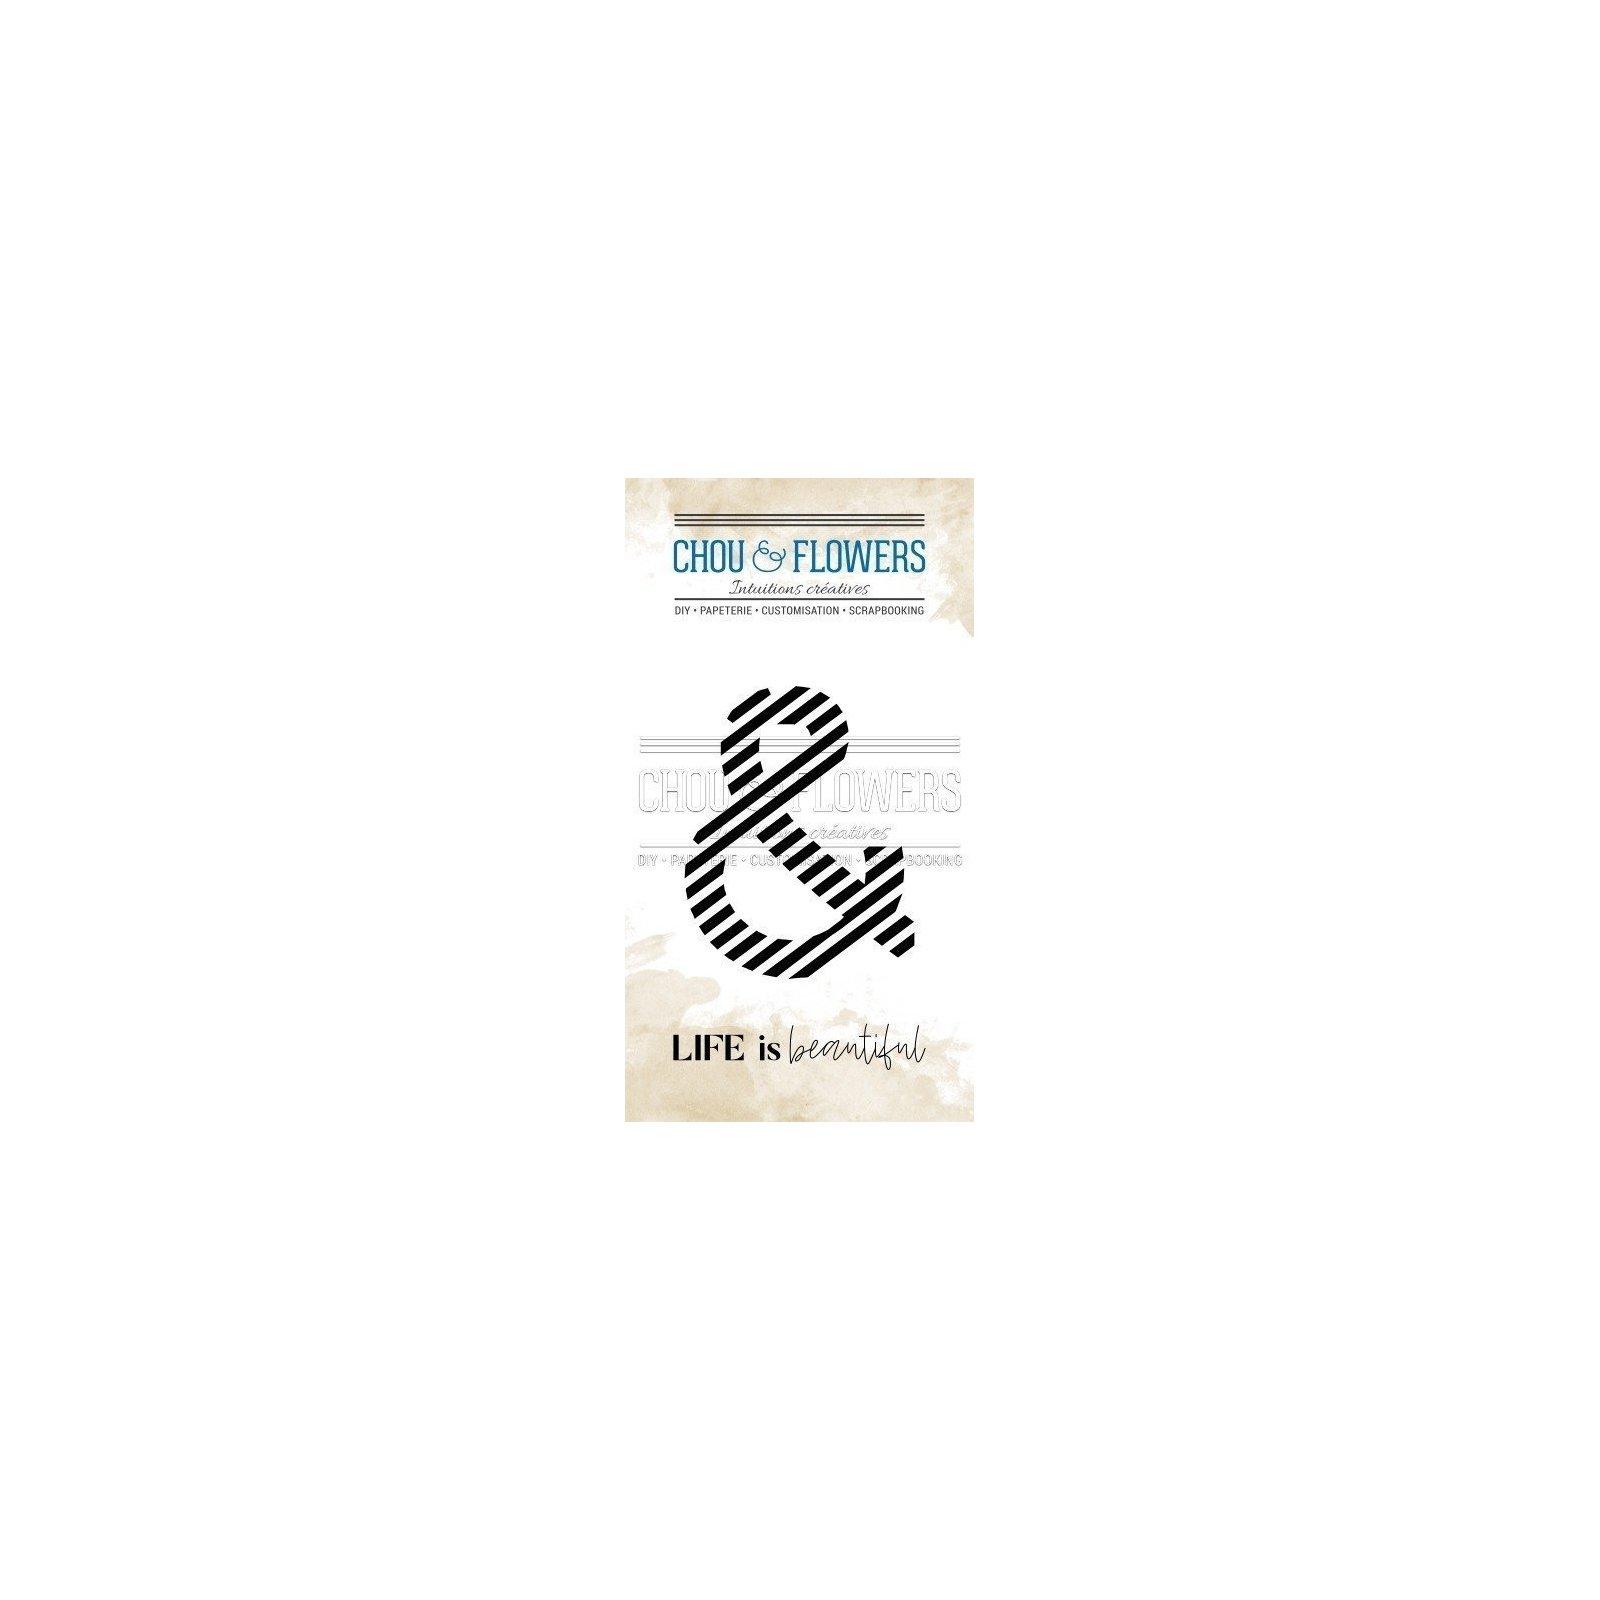 Tampon clear - Esperluette rayure - Voyage Imaginaire - Chou & Flowers